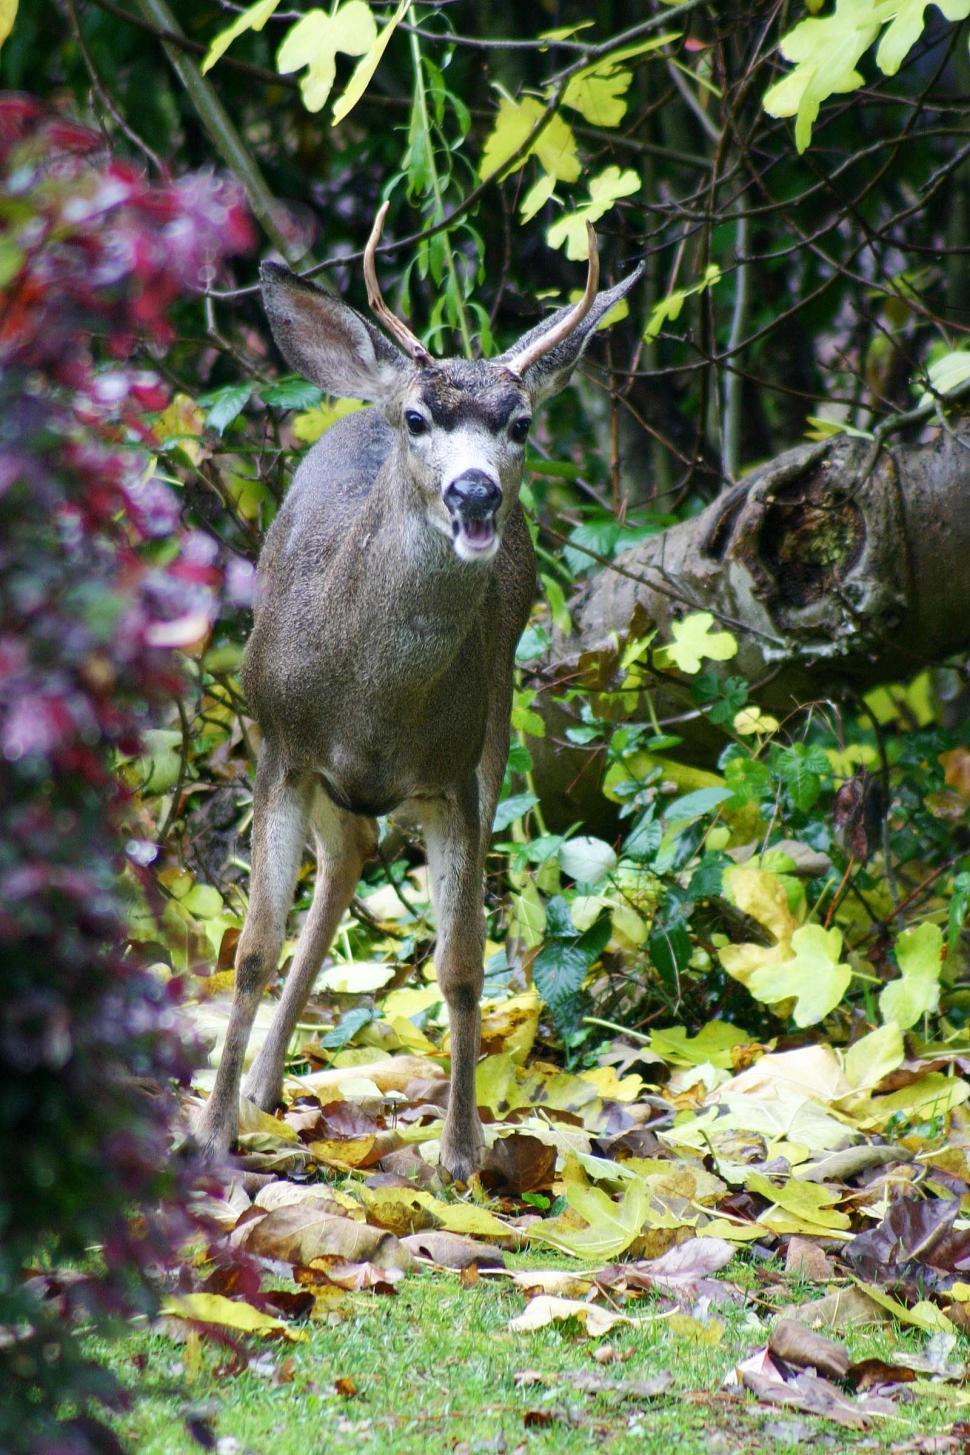 Download Free Stock Photo of deer eat leaves forest wildlife antlers animal